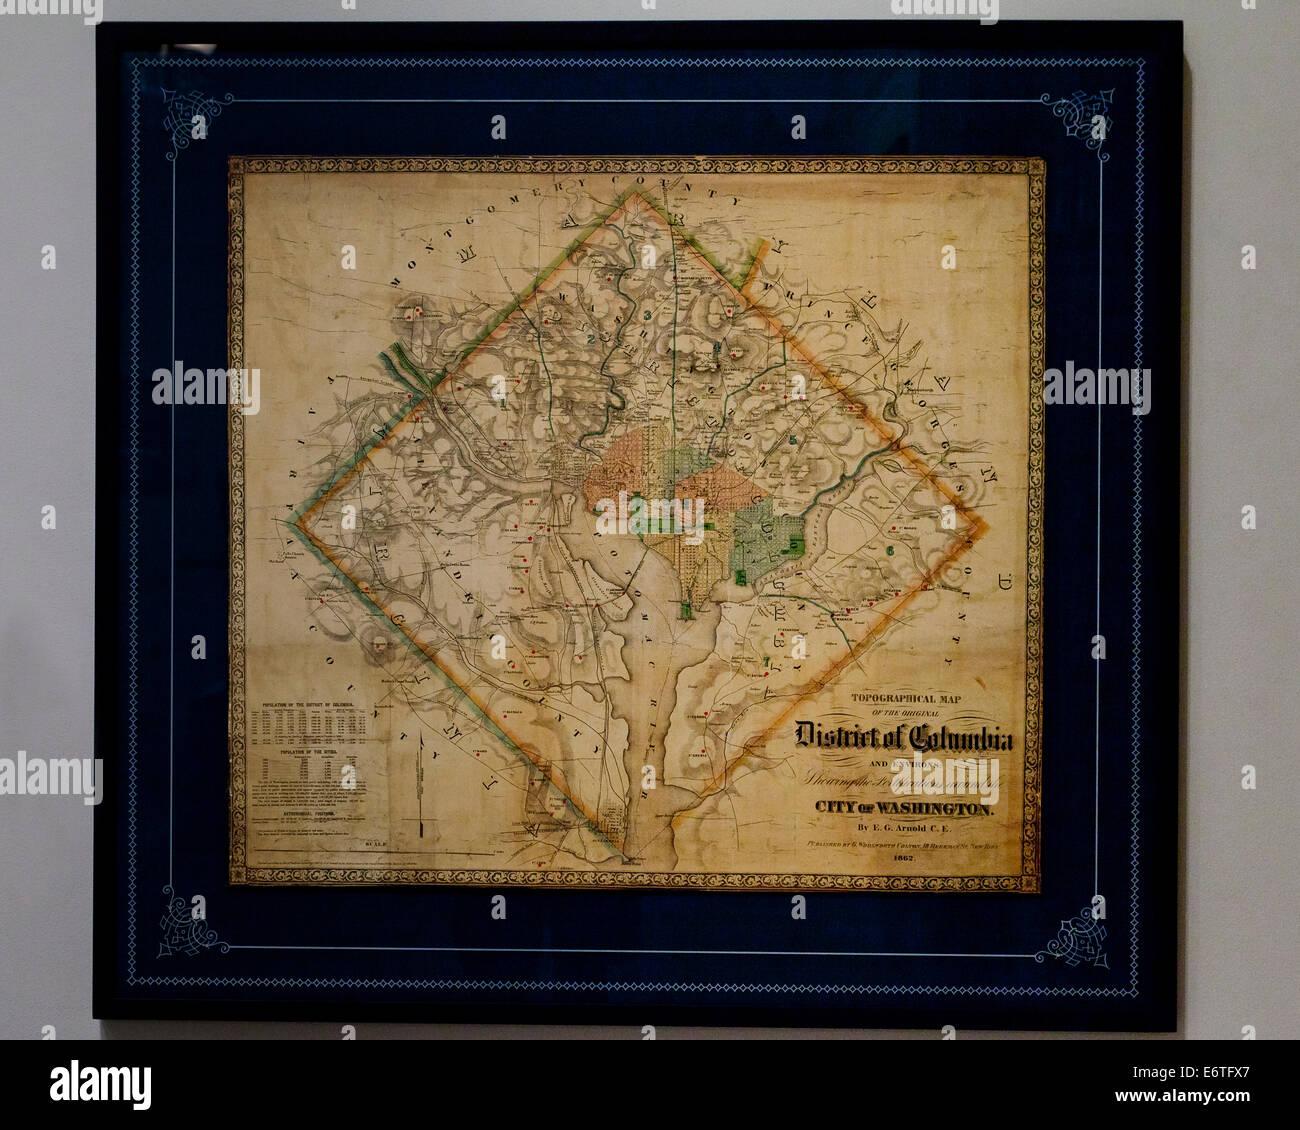 Topographic Map Washington Dc.Original Washington Dc Topographical Map By E G Arnold 1862 Stock